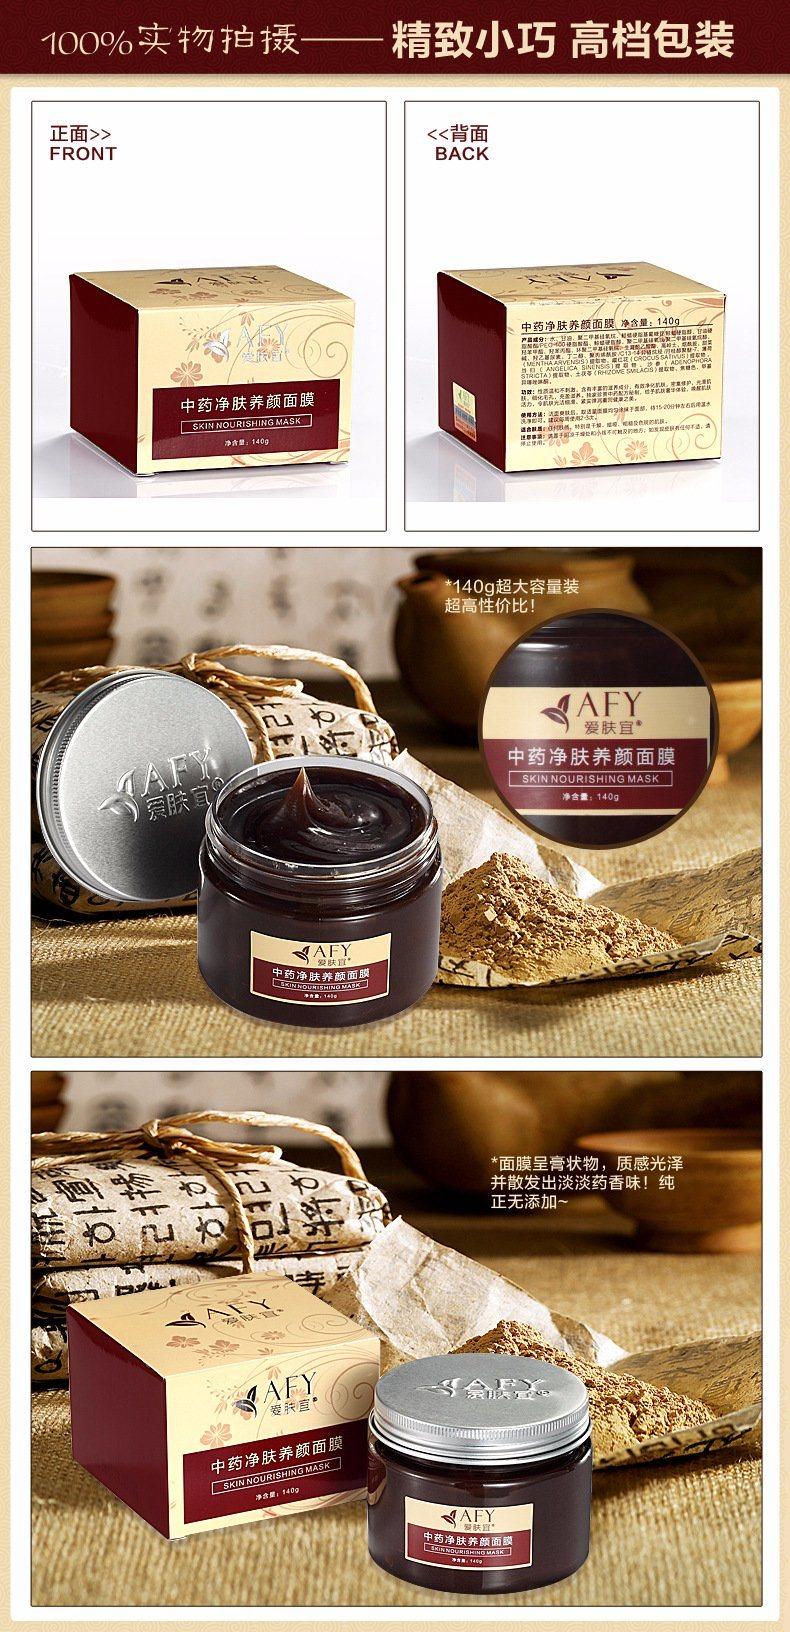 Afy Chinese Herbal Mild Ingredient Detox Whitening Facial Mask Shrink Pores Purification Skin Care Face Mask 140 G /PCS